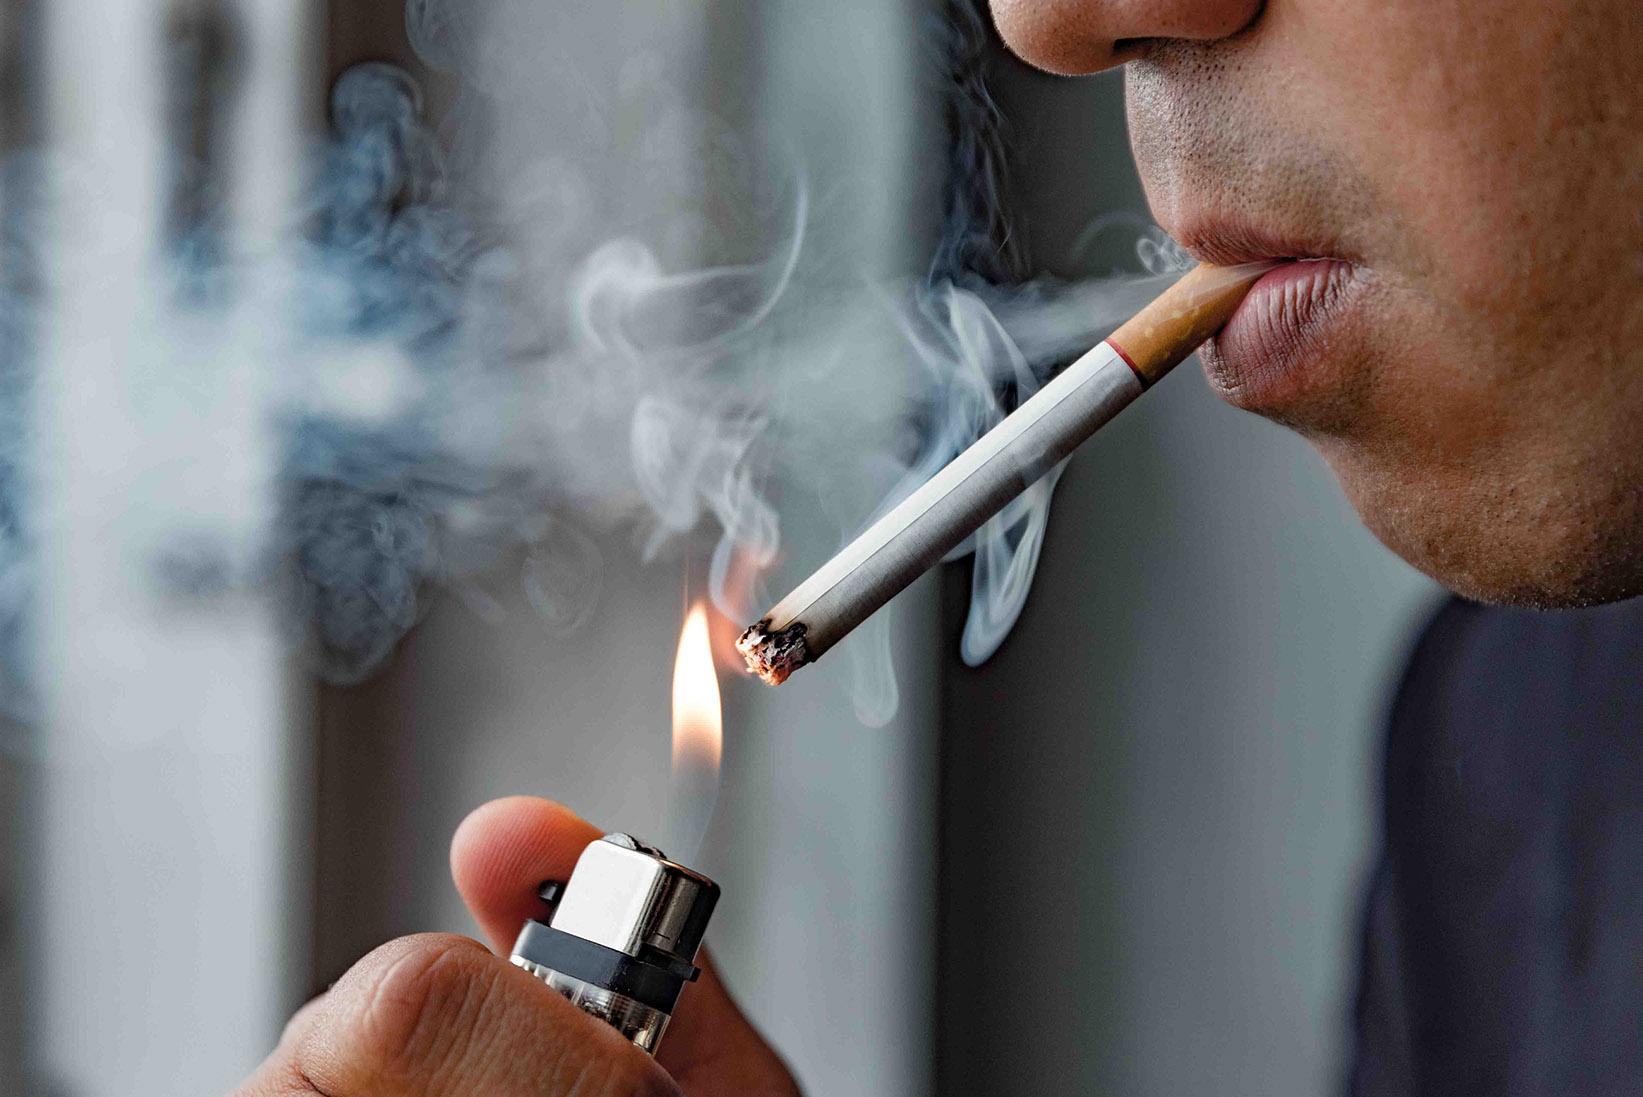 humo cigarrillo dañio salud